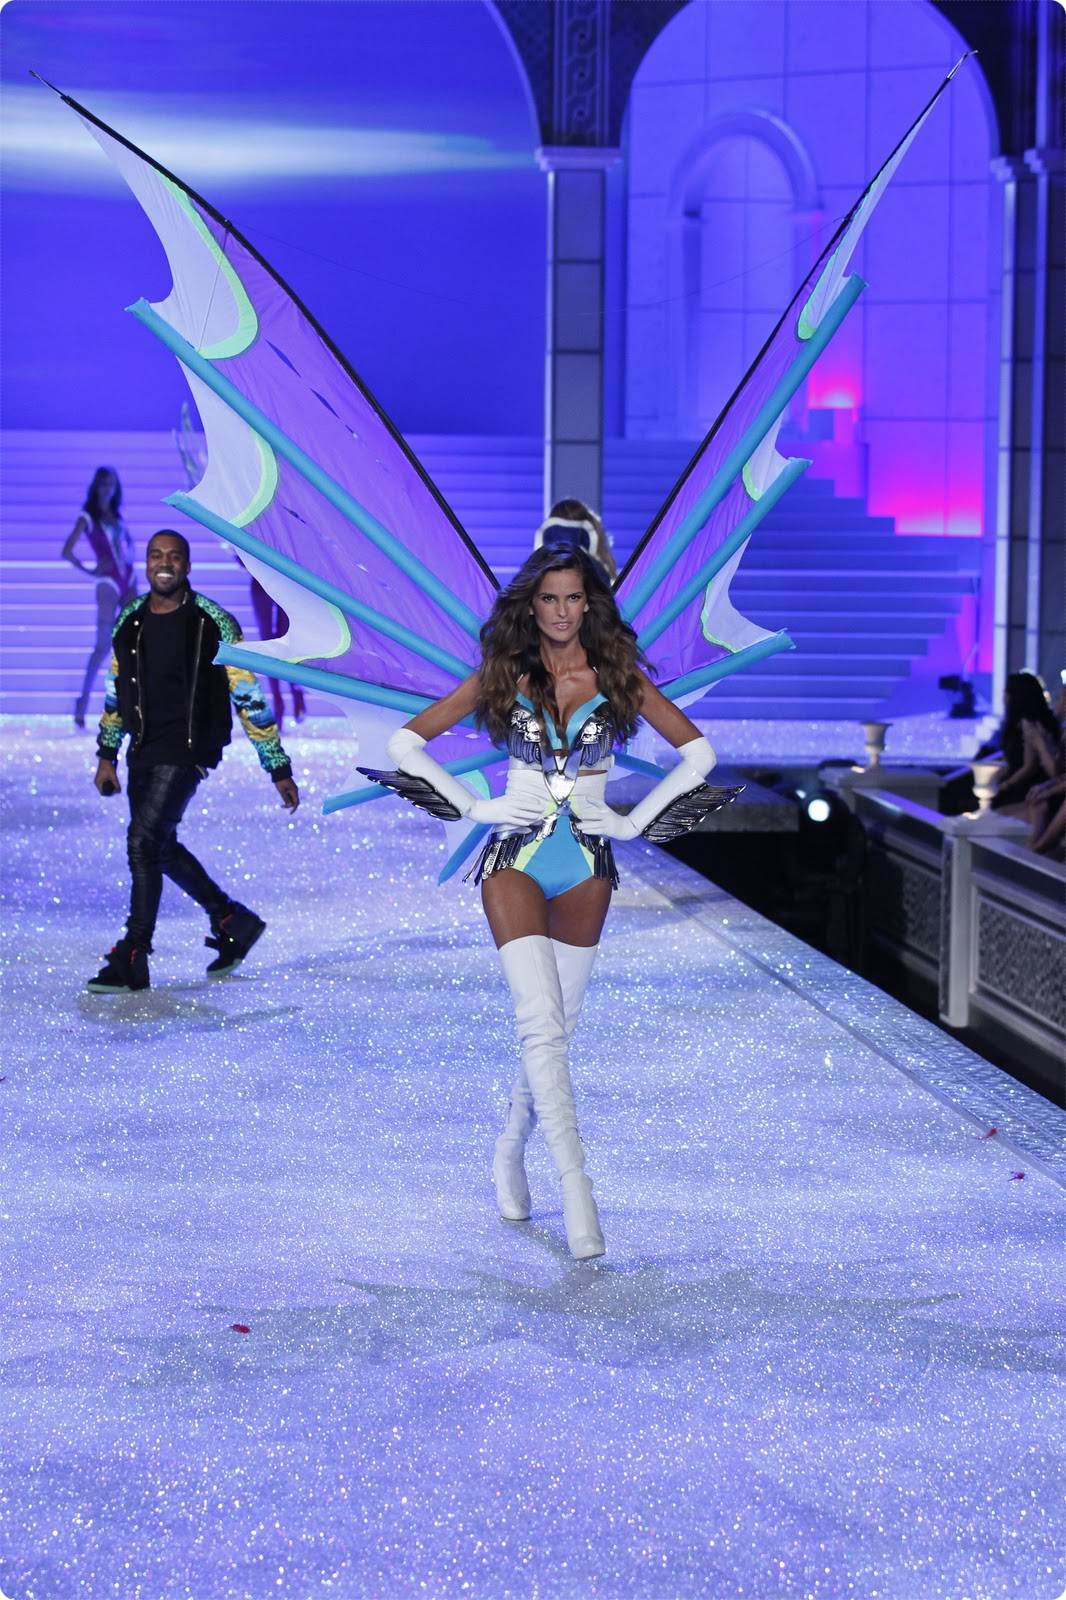 http://4.bp.blogspot.com/-zNDAVzgxaeg/TxuT_-y-pLI/AAAAAAAAARI/WWXU76vru0c/s1600/fashion-show-runway-2011-izabel-super-angels-victorias-secret-hi-resuperangels-horz.jpg